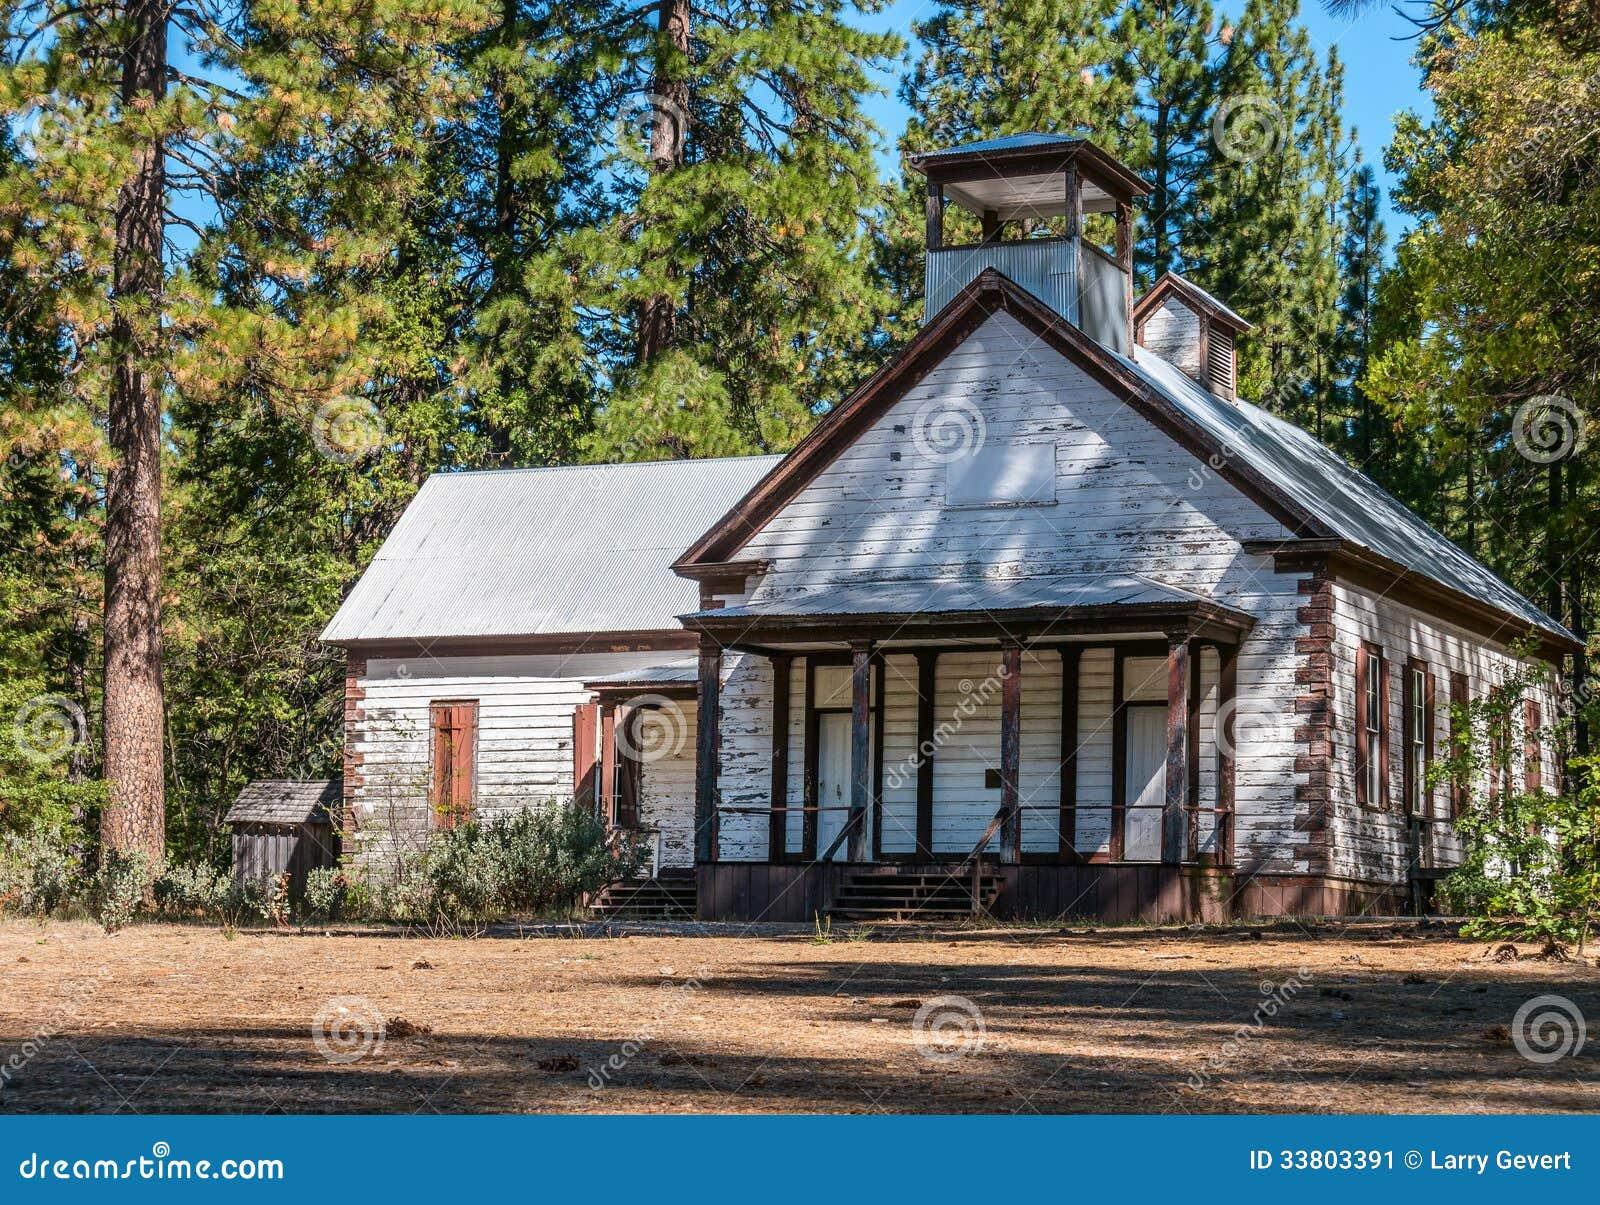 Old schoolhouse in rural California